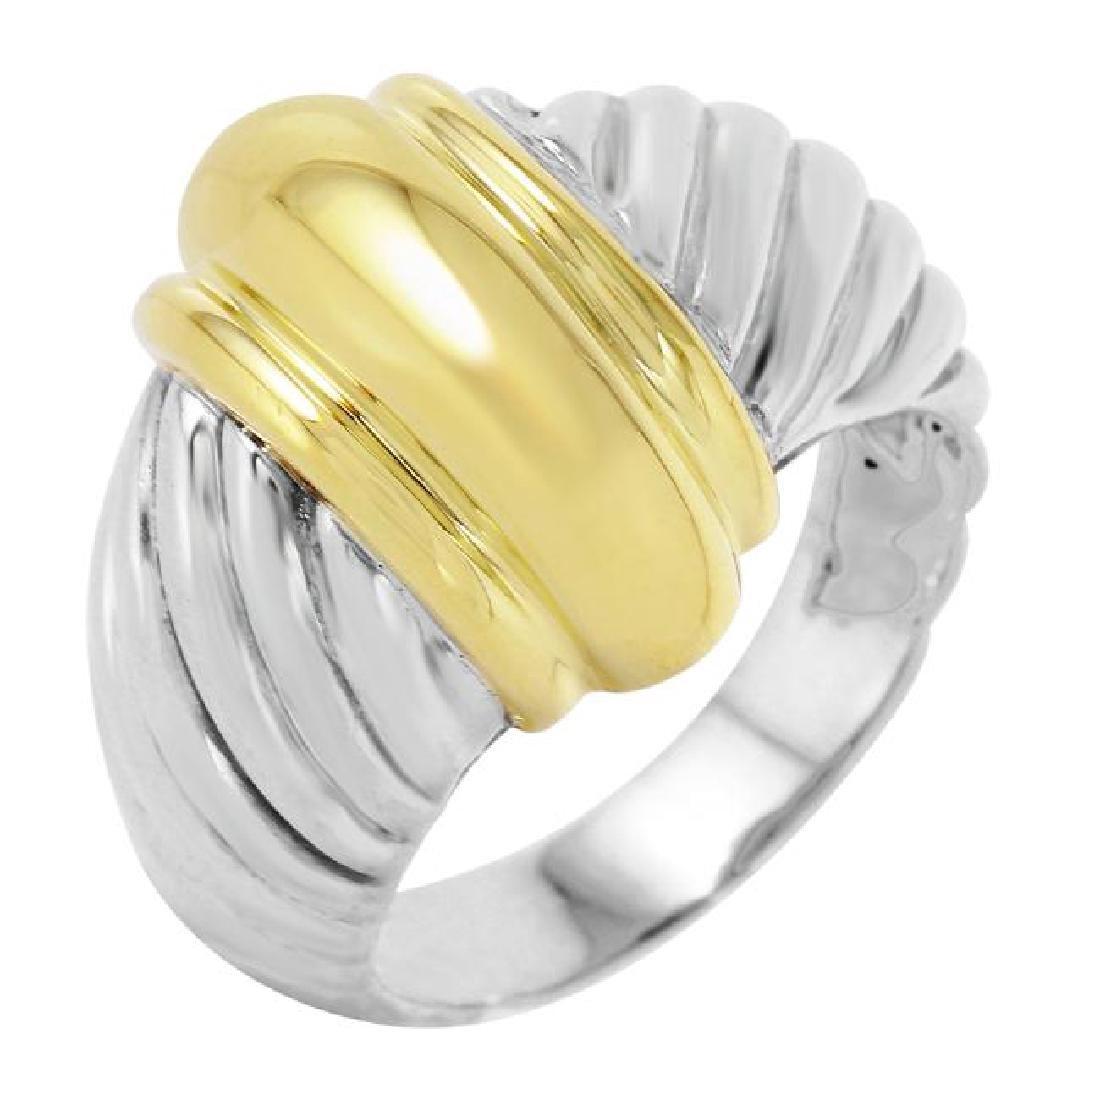 David Yurman Sterling Silver 18K Gold Ring